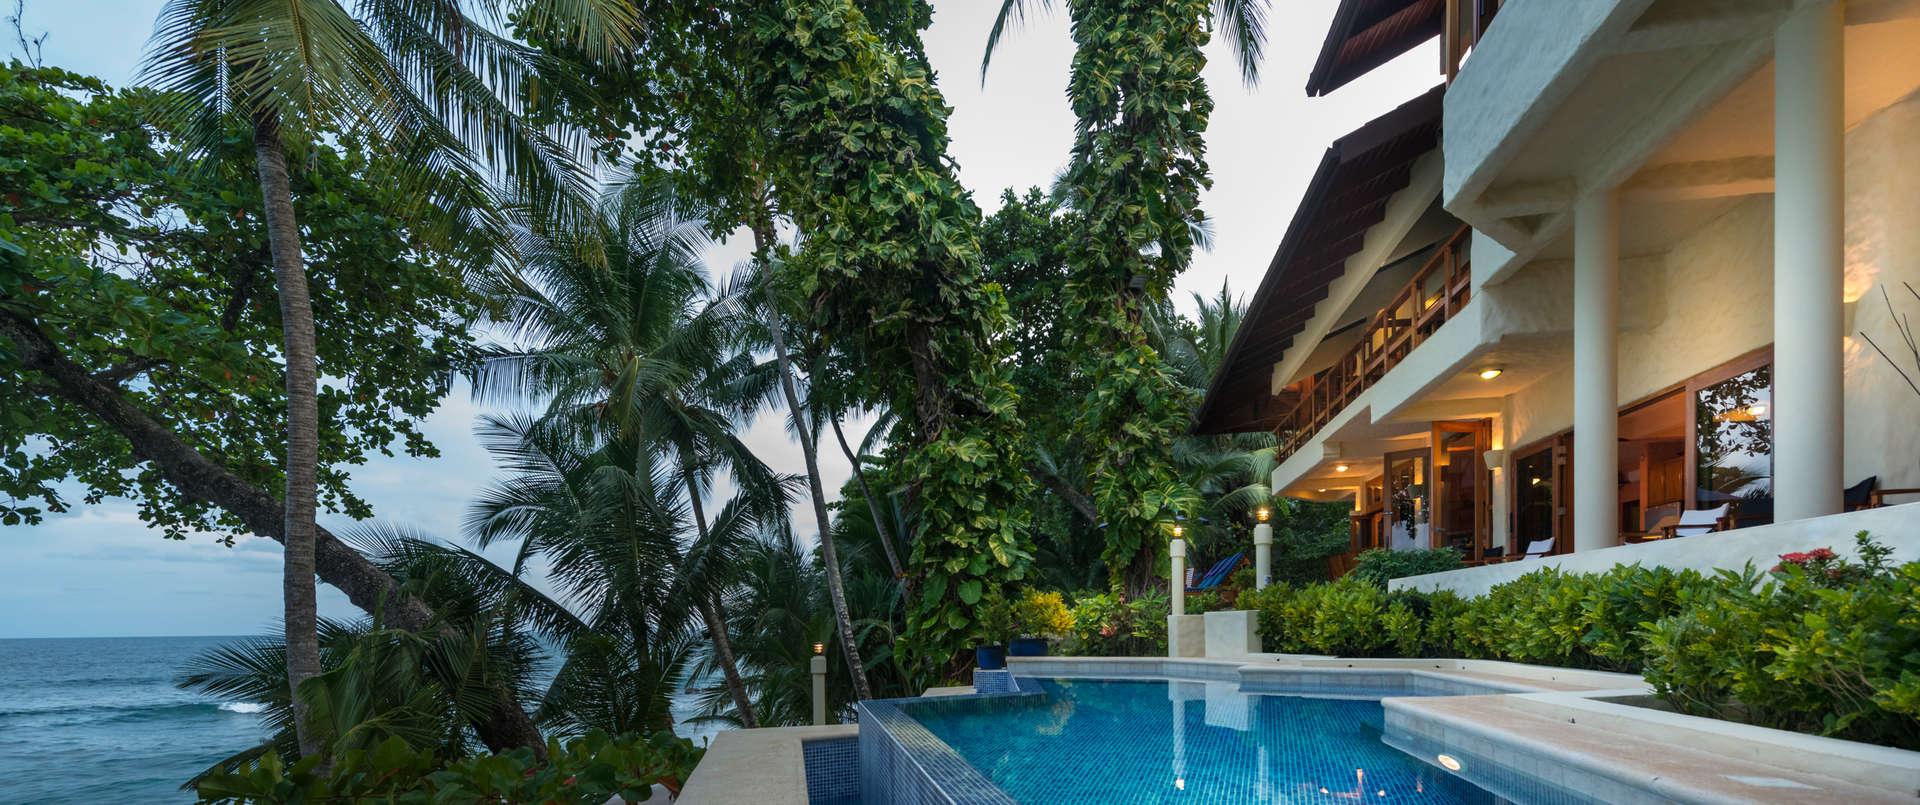 Central america villa rentals - Costa rica - Puntarenas - Tango mar - Estate Oceano - Image 1/24